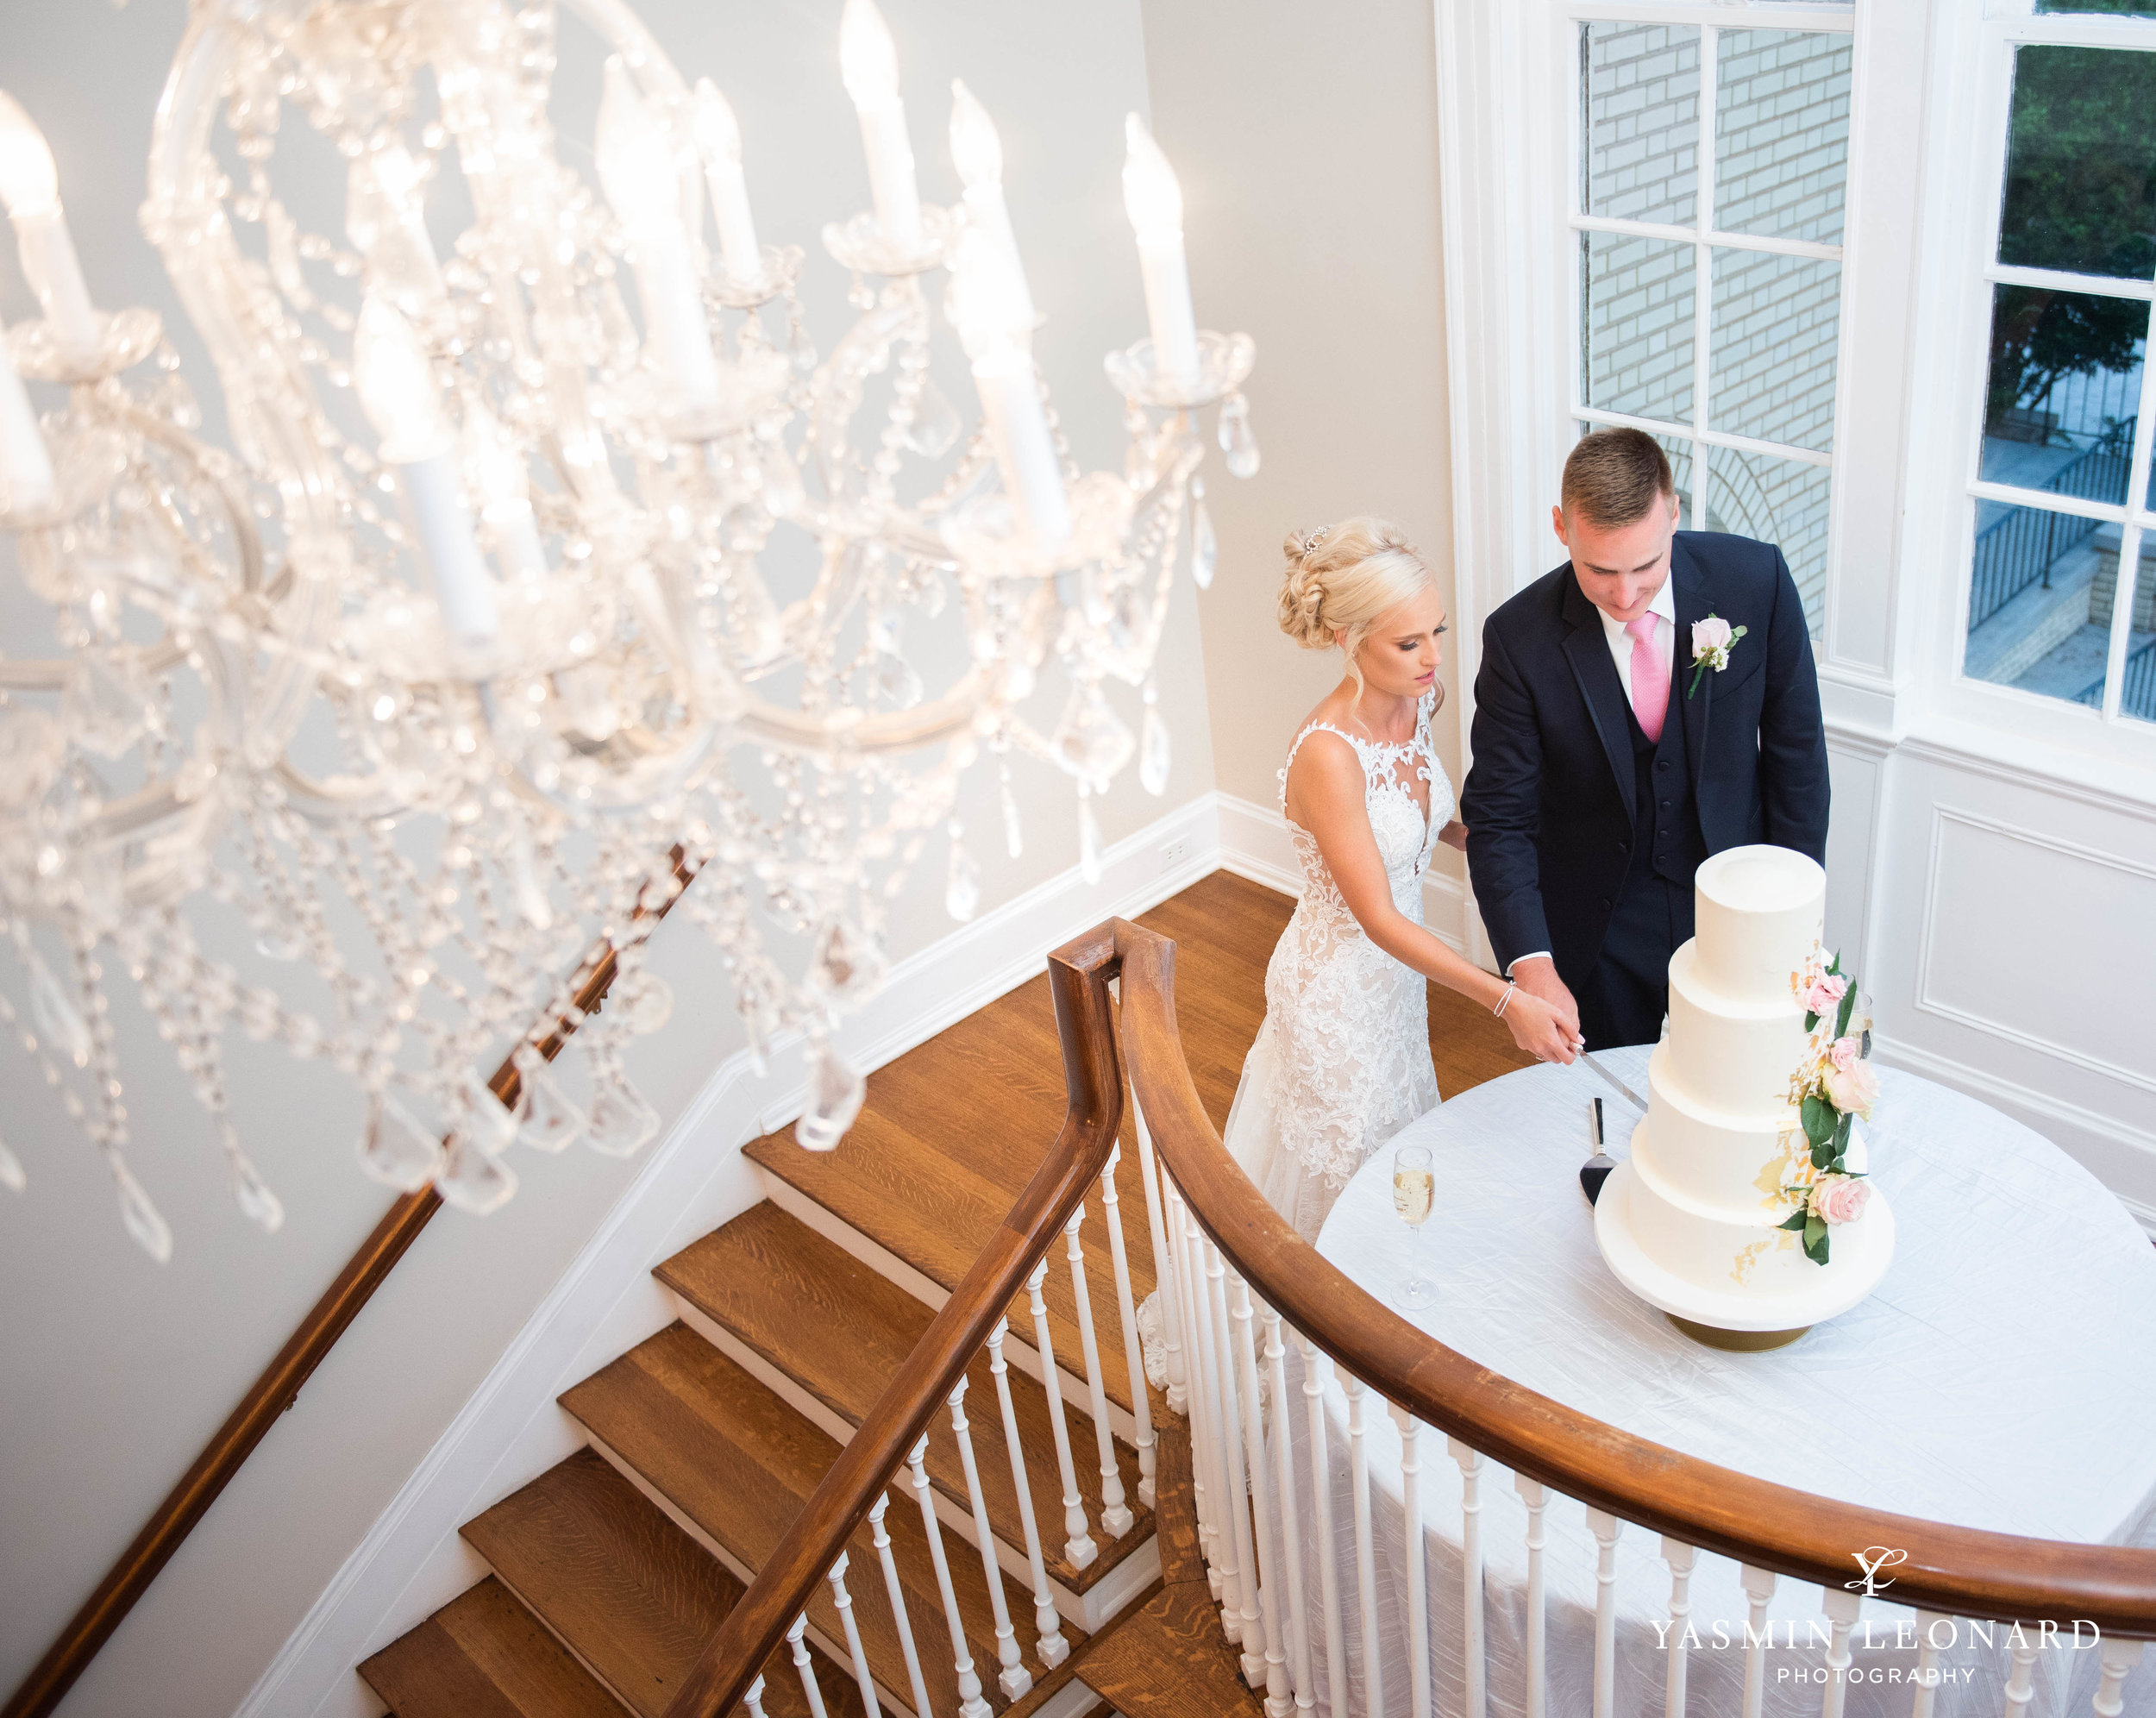 Separk Mansion - NC Weddings - Gastonia Wedding - NC Wedding Venues - Pink and Blue Wedding Ideas - Pink Bridesmaid Dresses - Yasmin Leonard Photography-56.jpg